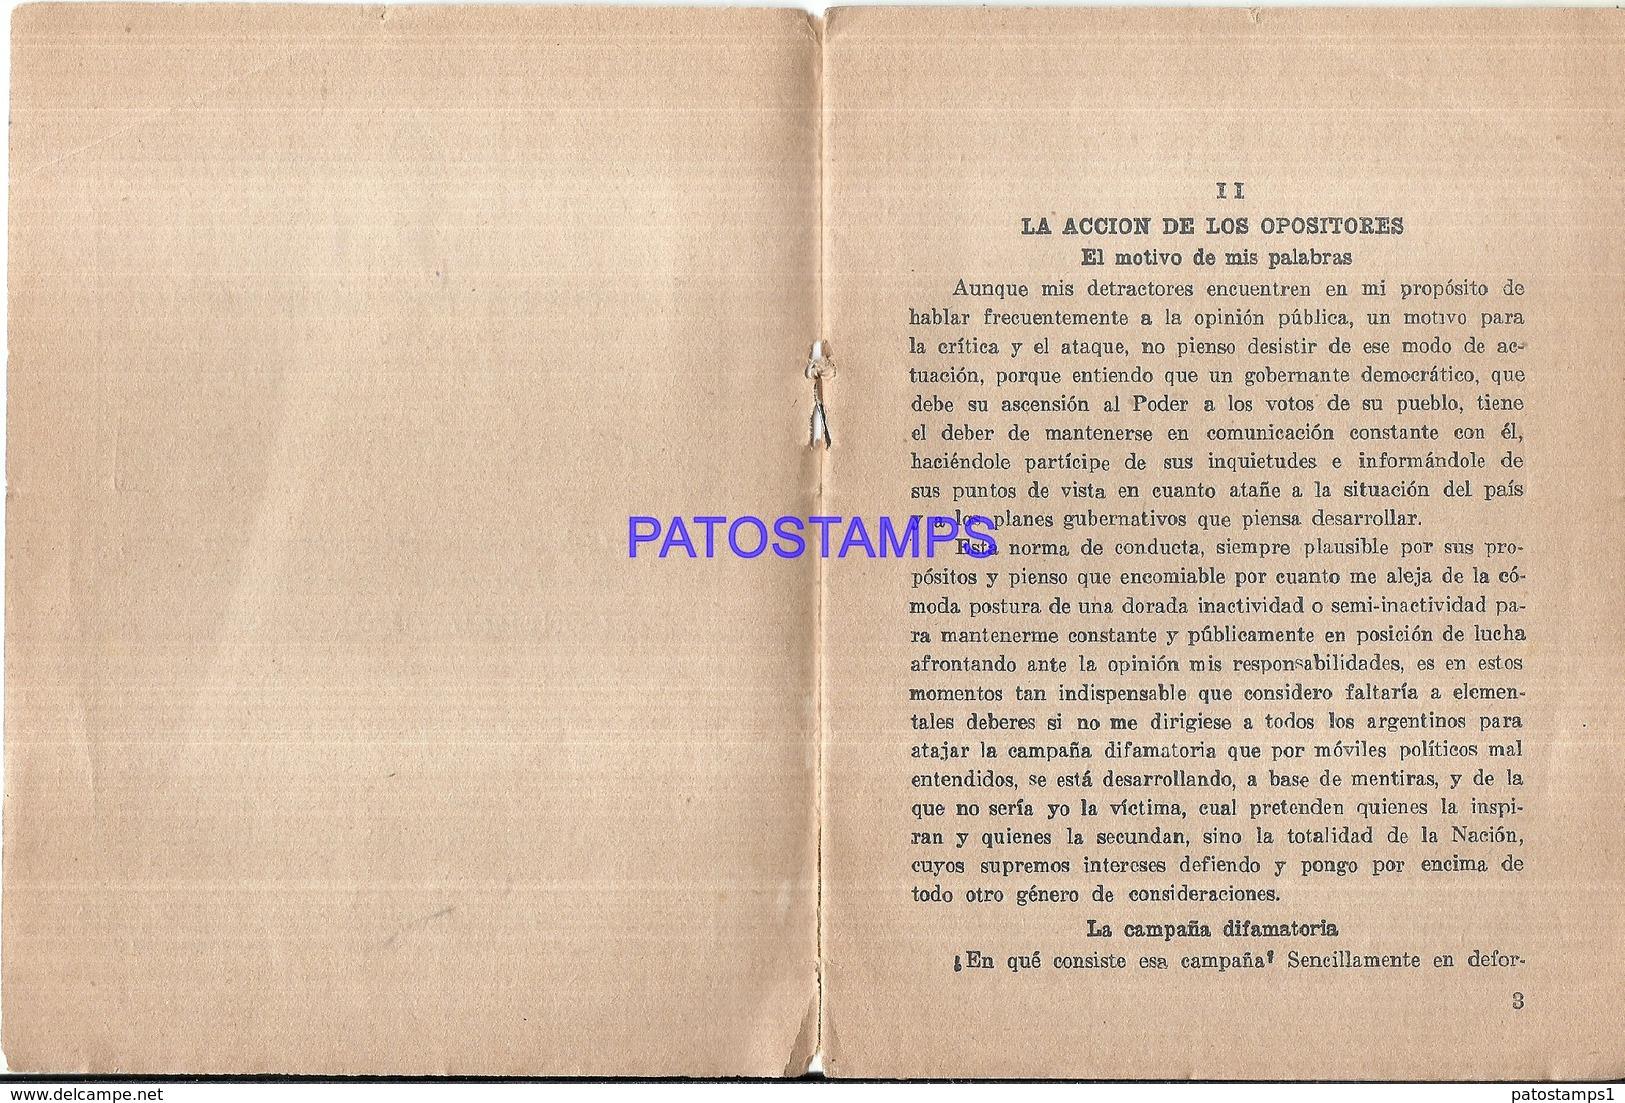 117185 ARGENTINA PERONISMO GRAL PERON LA OBRA DE GOBIERNO CICLO DE CONFERENCIA II LIBRILLO NO POSTAL POSTCARD - Altre Collezioni